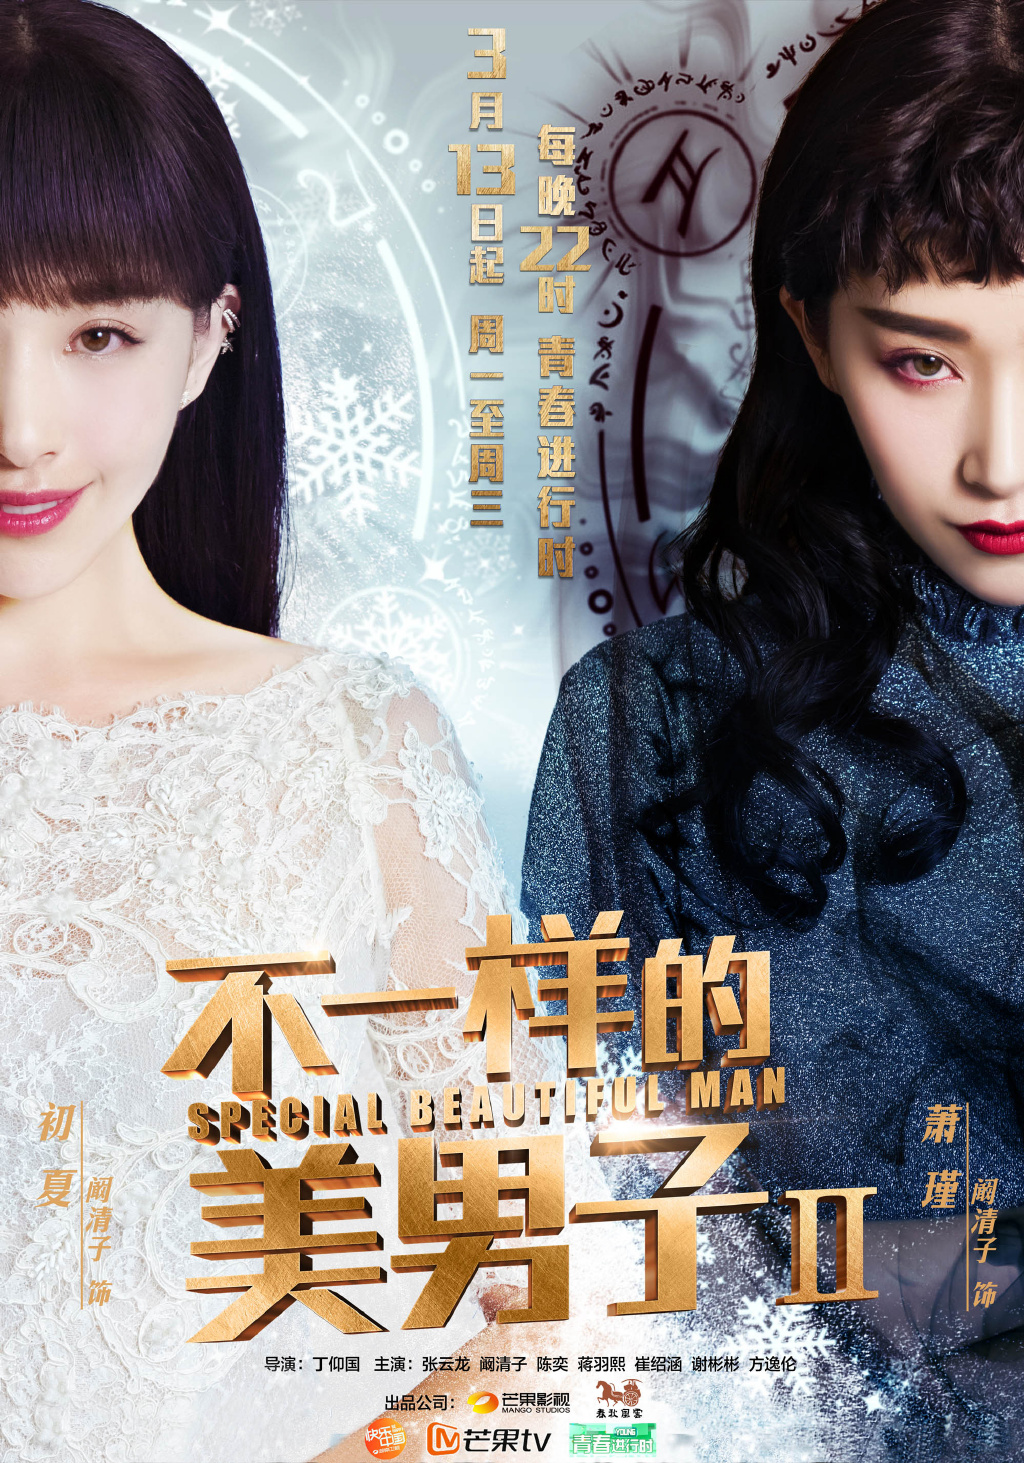 A Different Kind of Pretty Man 2 (2017) - DramaPanda